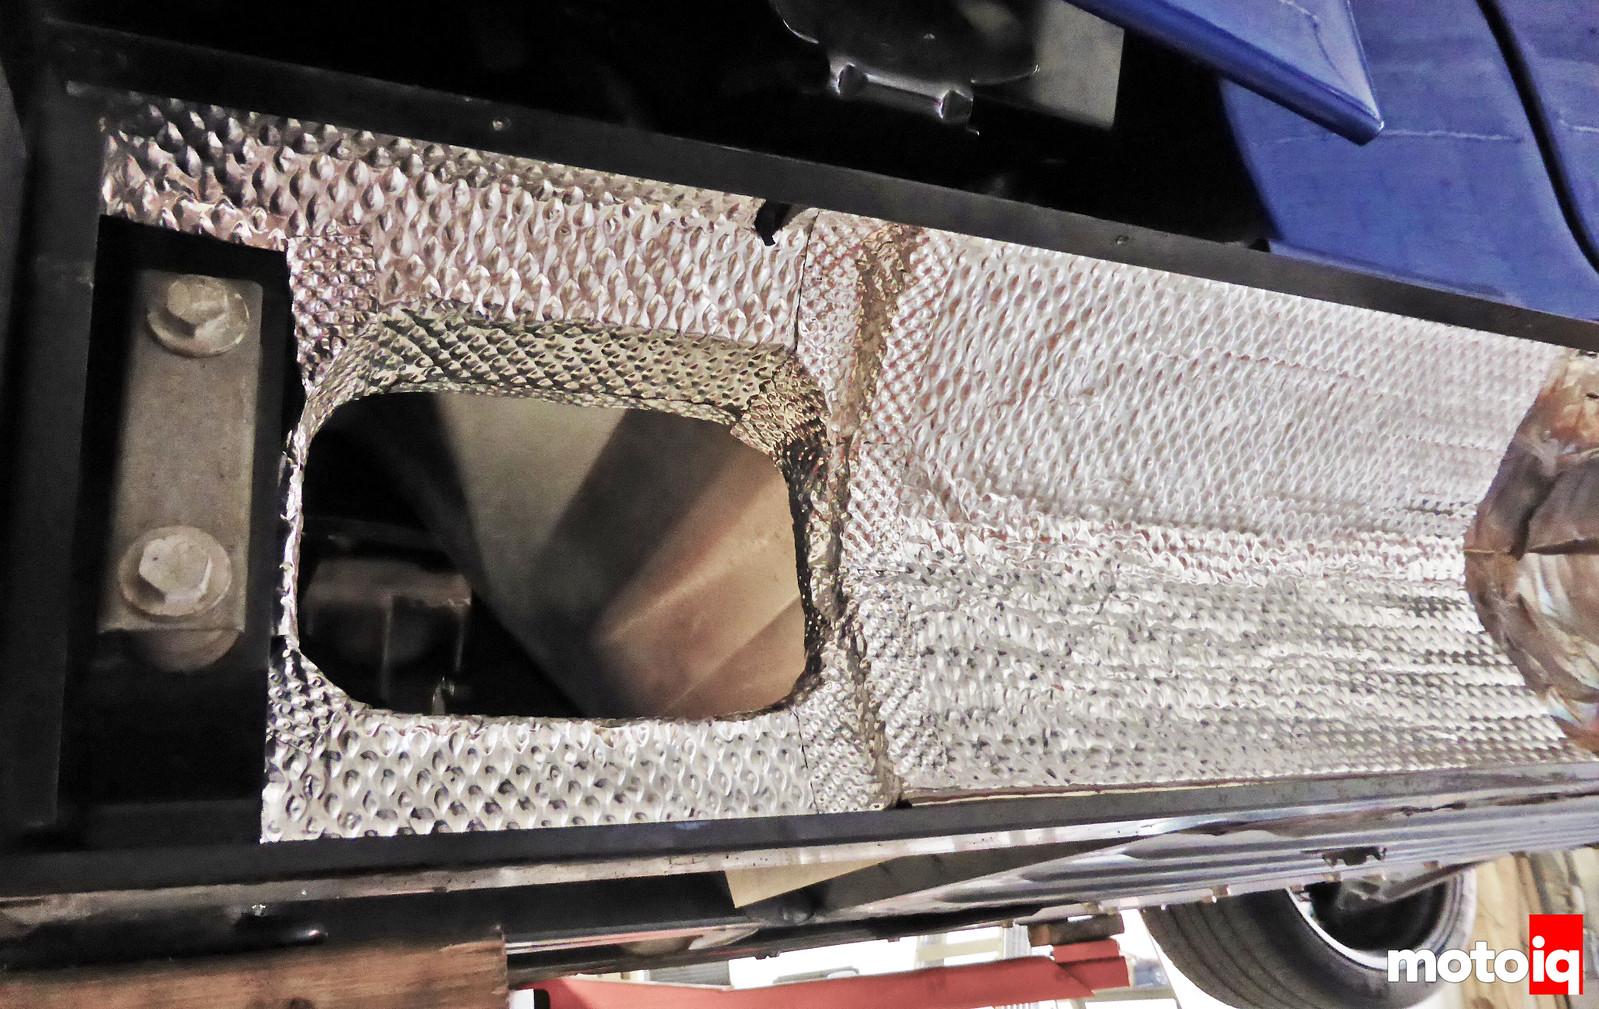 Viper GTS HeatShield Products HP Stickyshield side sill